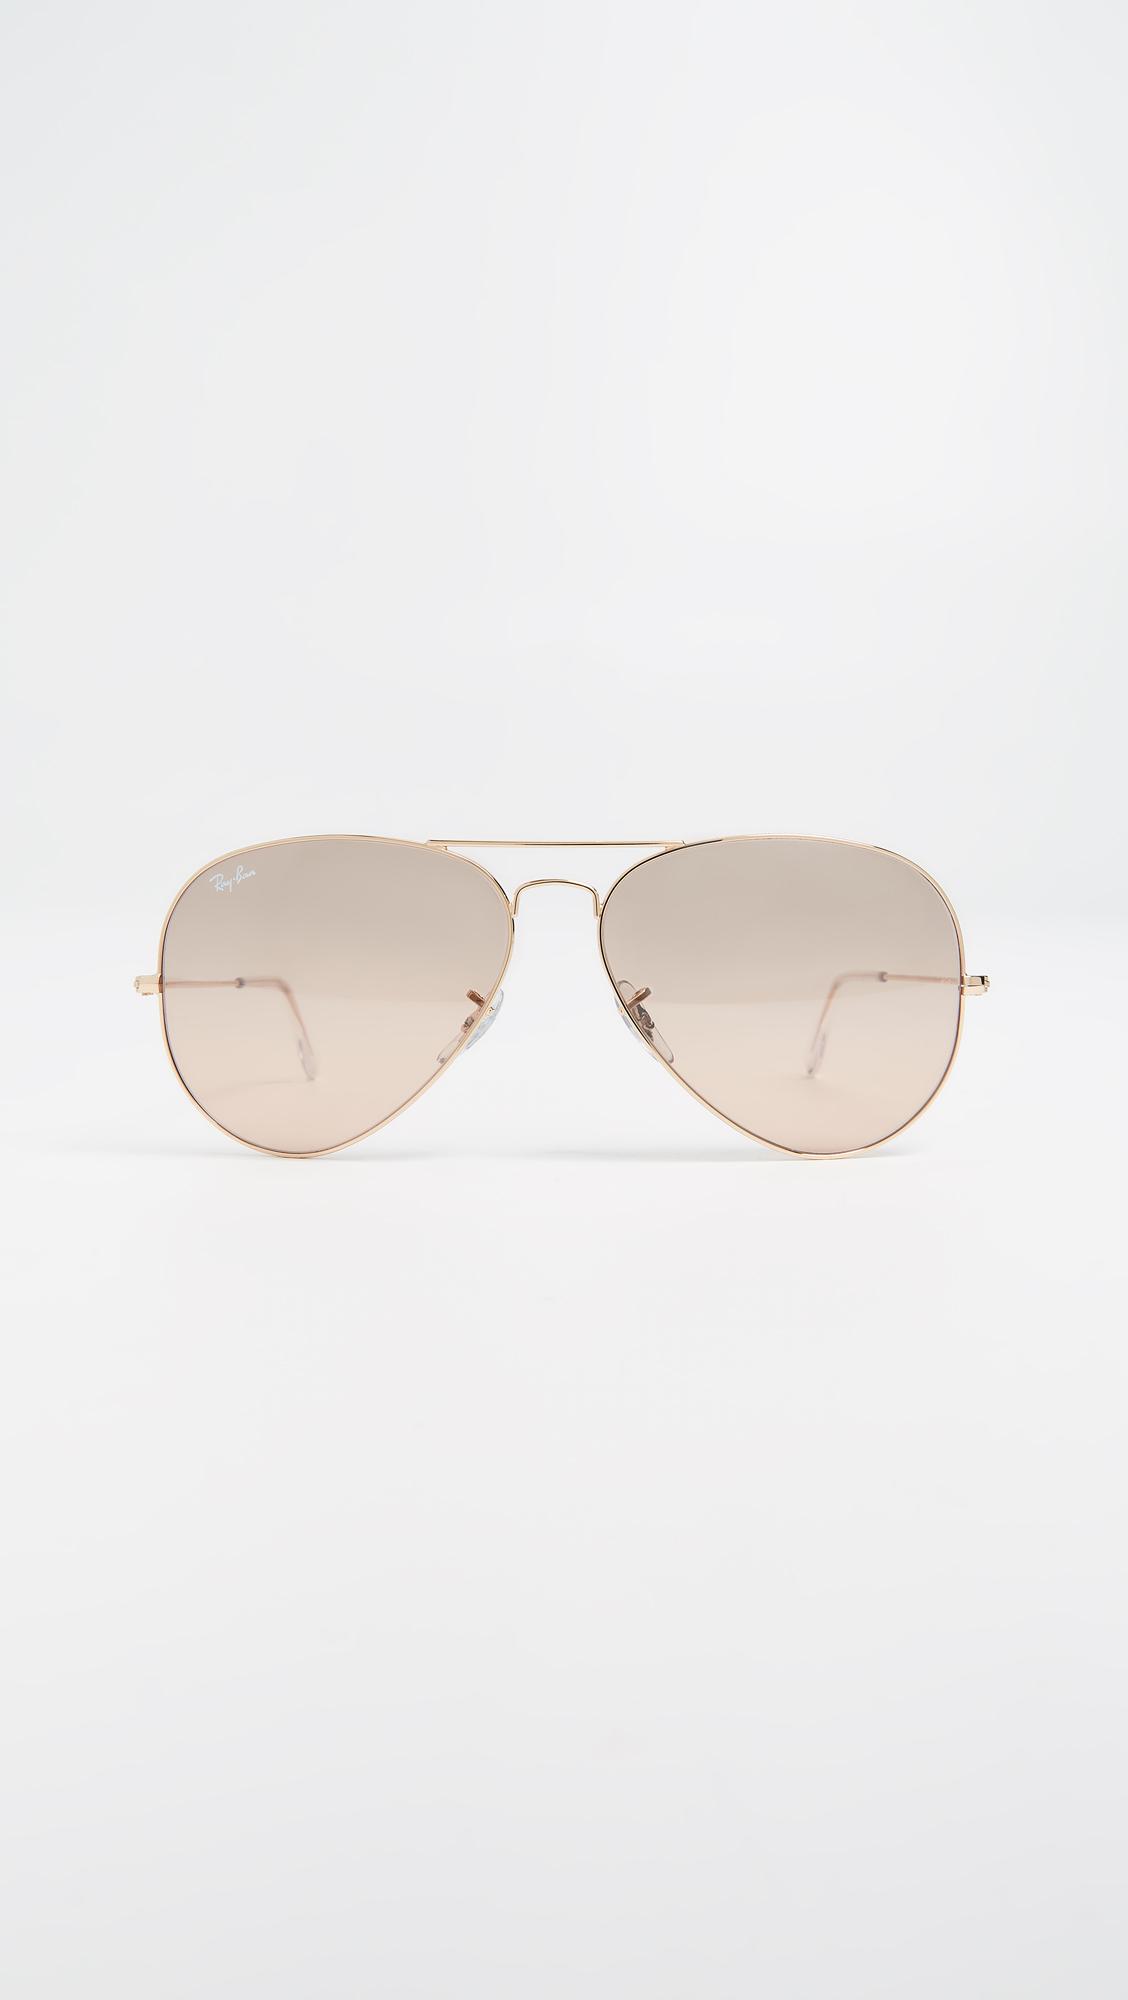 d8dfa39f5eb05 Ray-Ban Oversized Original Aviator Sunglasses   SHOPBOP